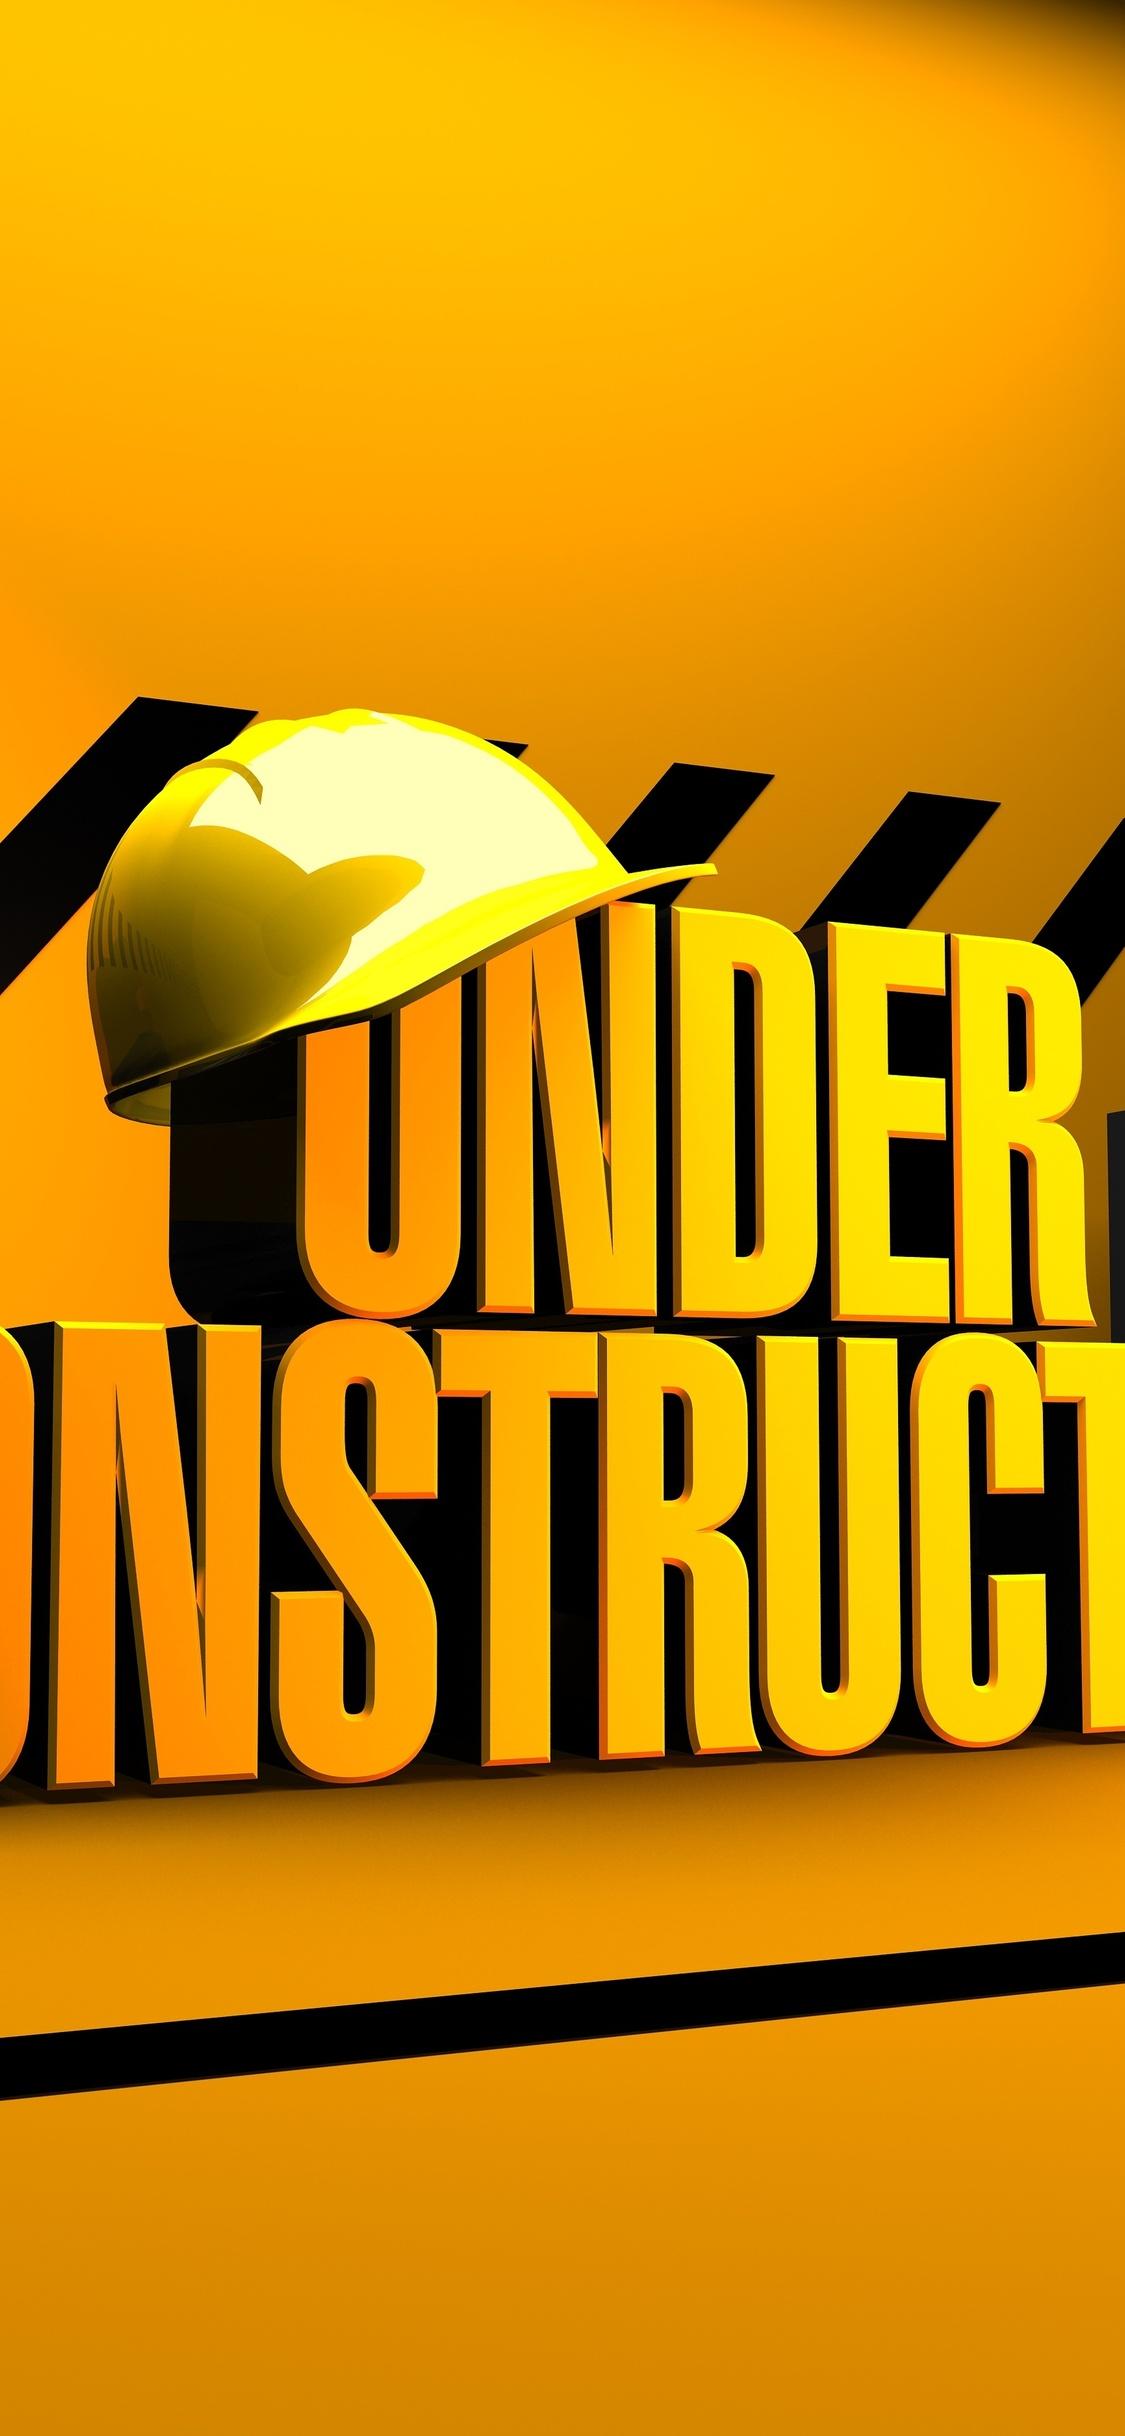 1125x2436 Under Construction Build Work Architecture Iphone